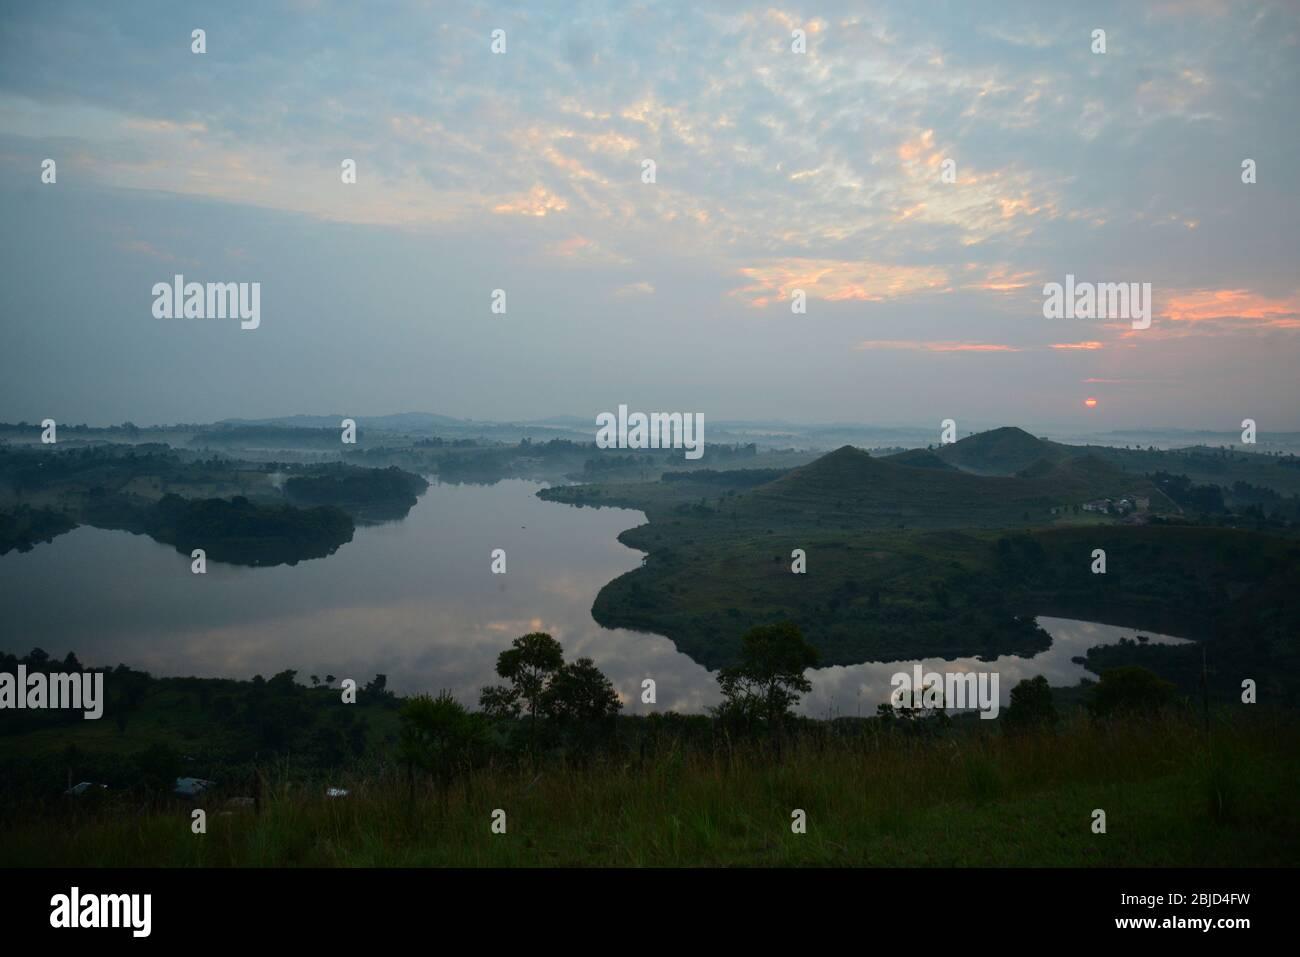 Kraterseen in der Nähe von Fort Portal in Uganda, Zentralafrika. Stockfoto